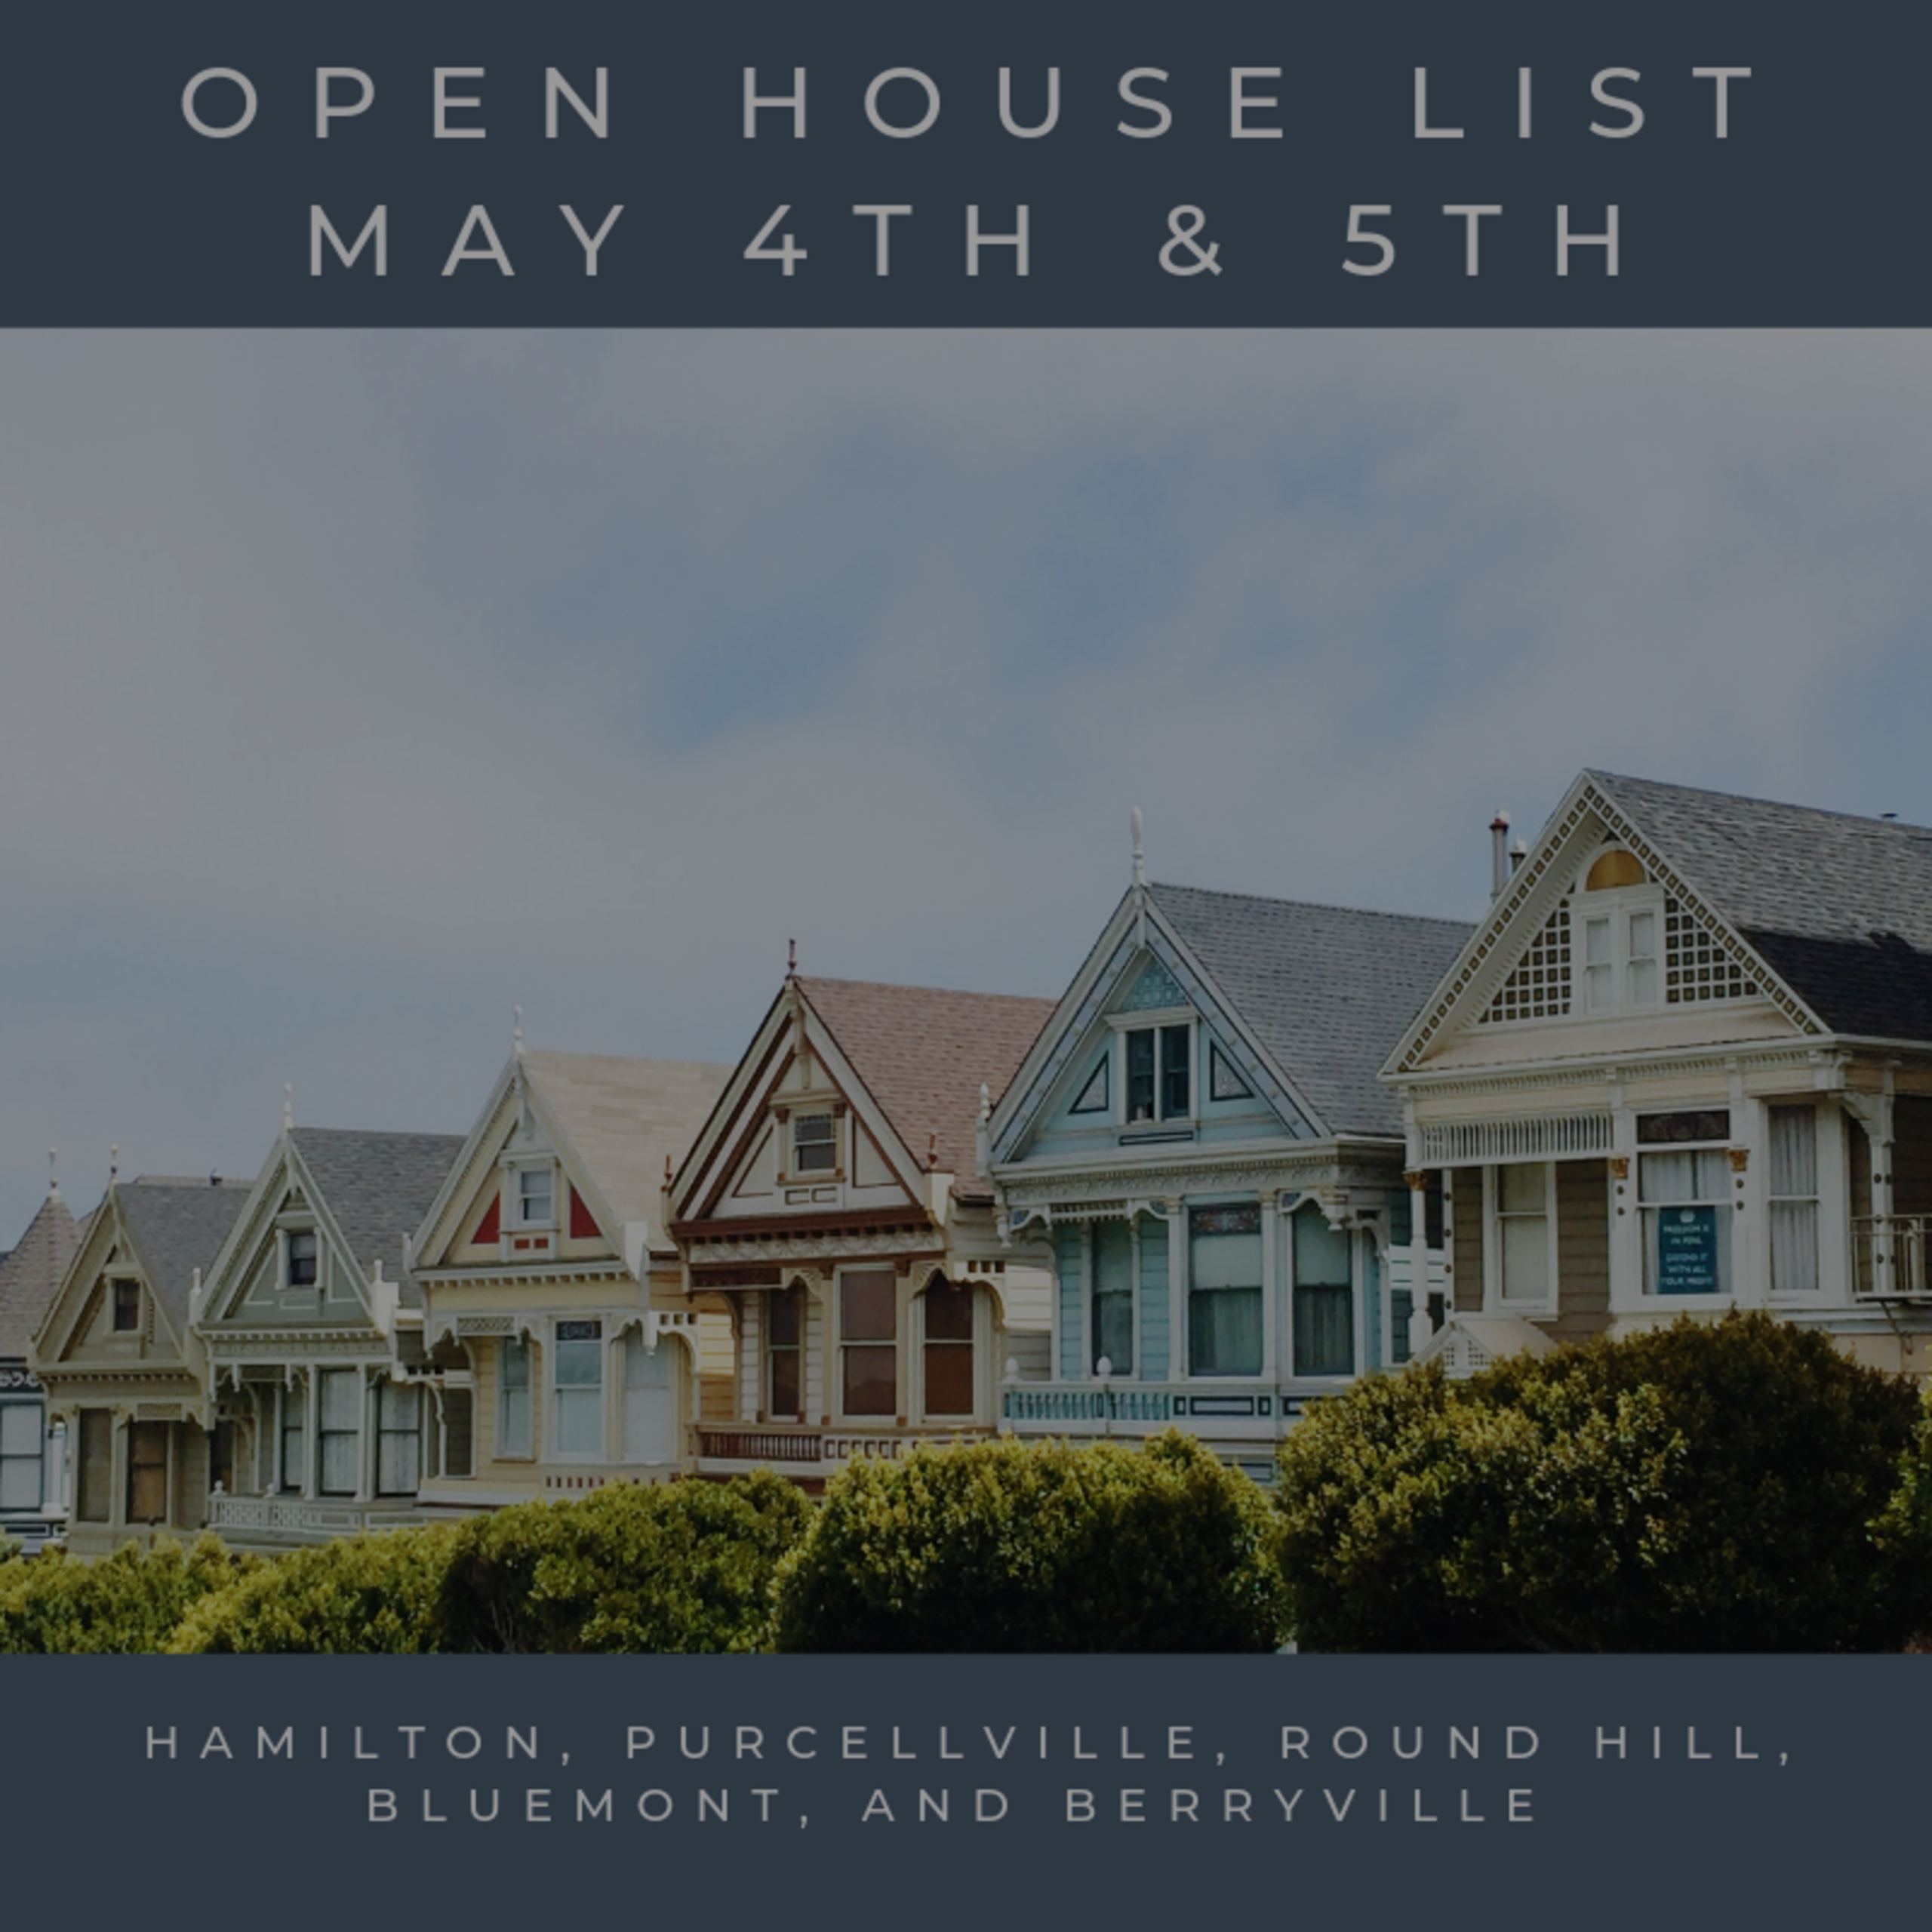 Open House List 5/4/19 – 5/5/19